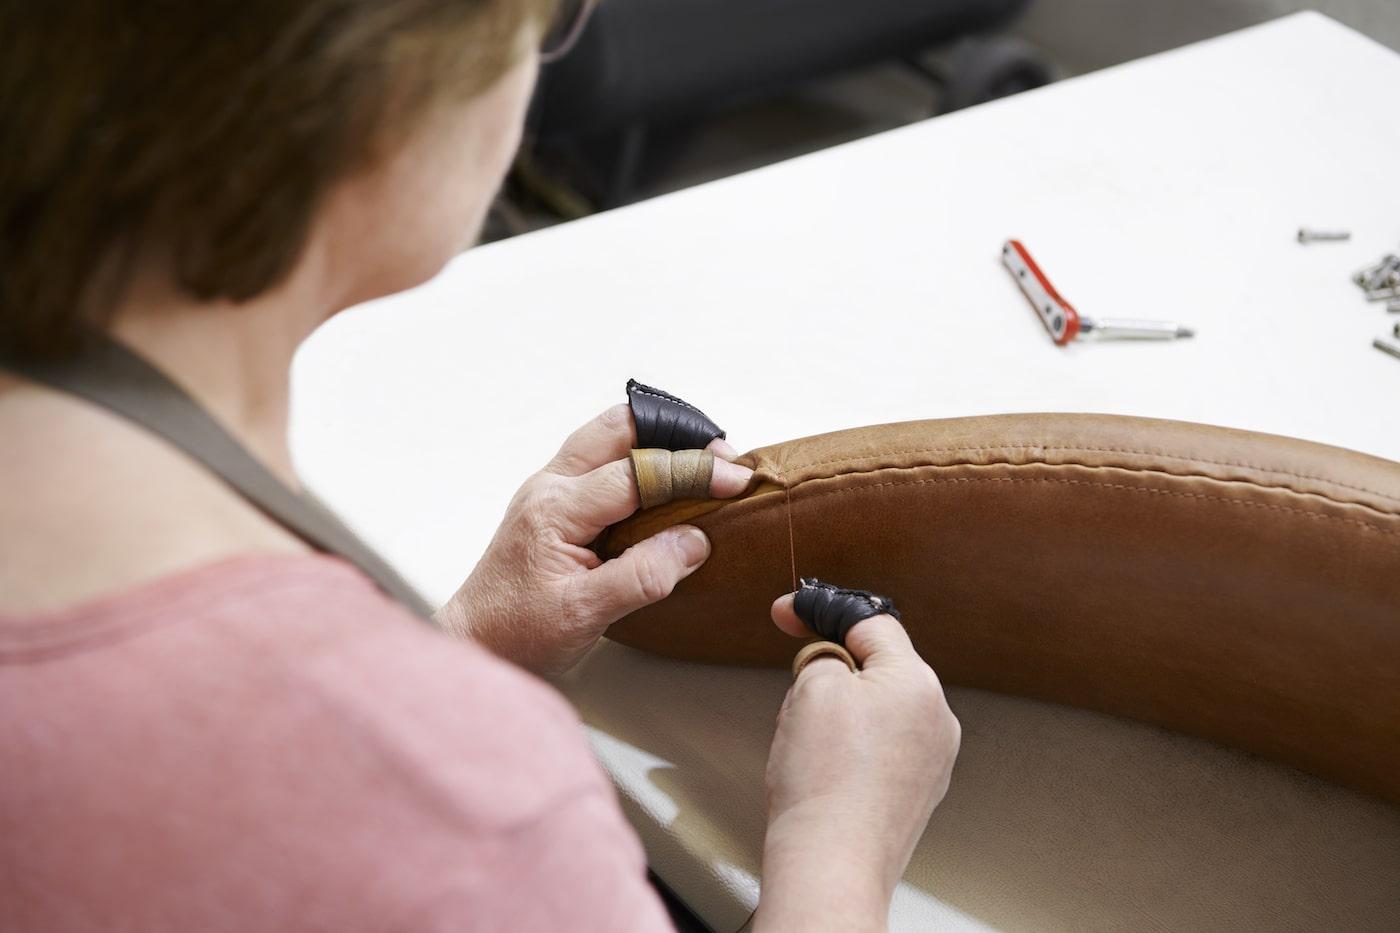 Woman sewing new leather onto Erik Jorgensen Corona chair